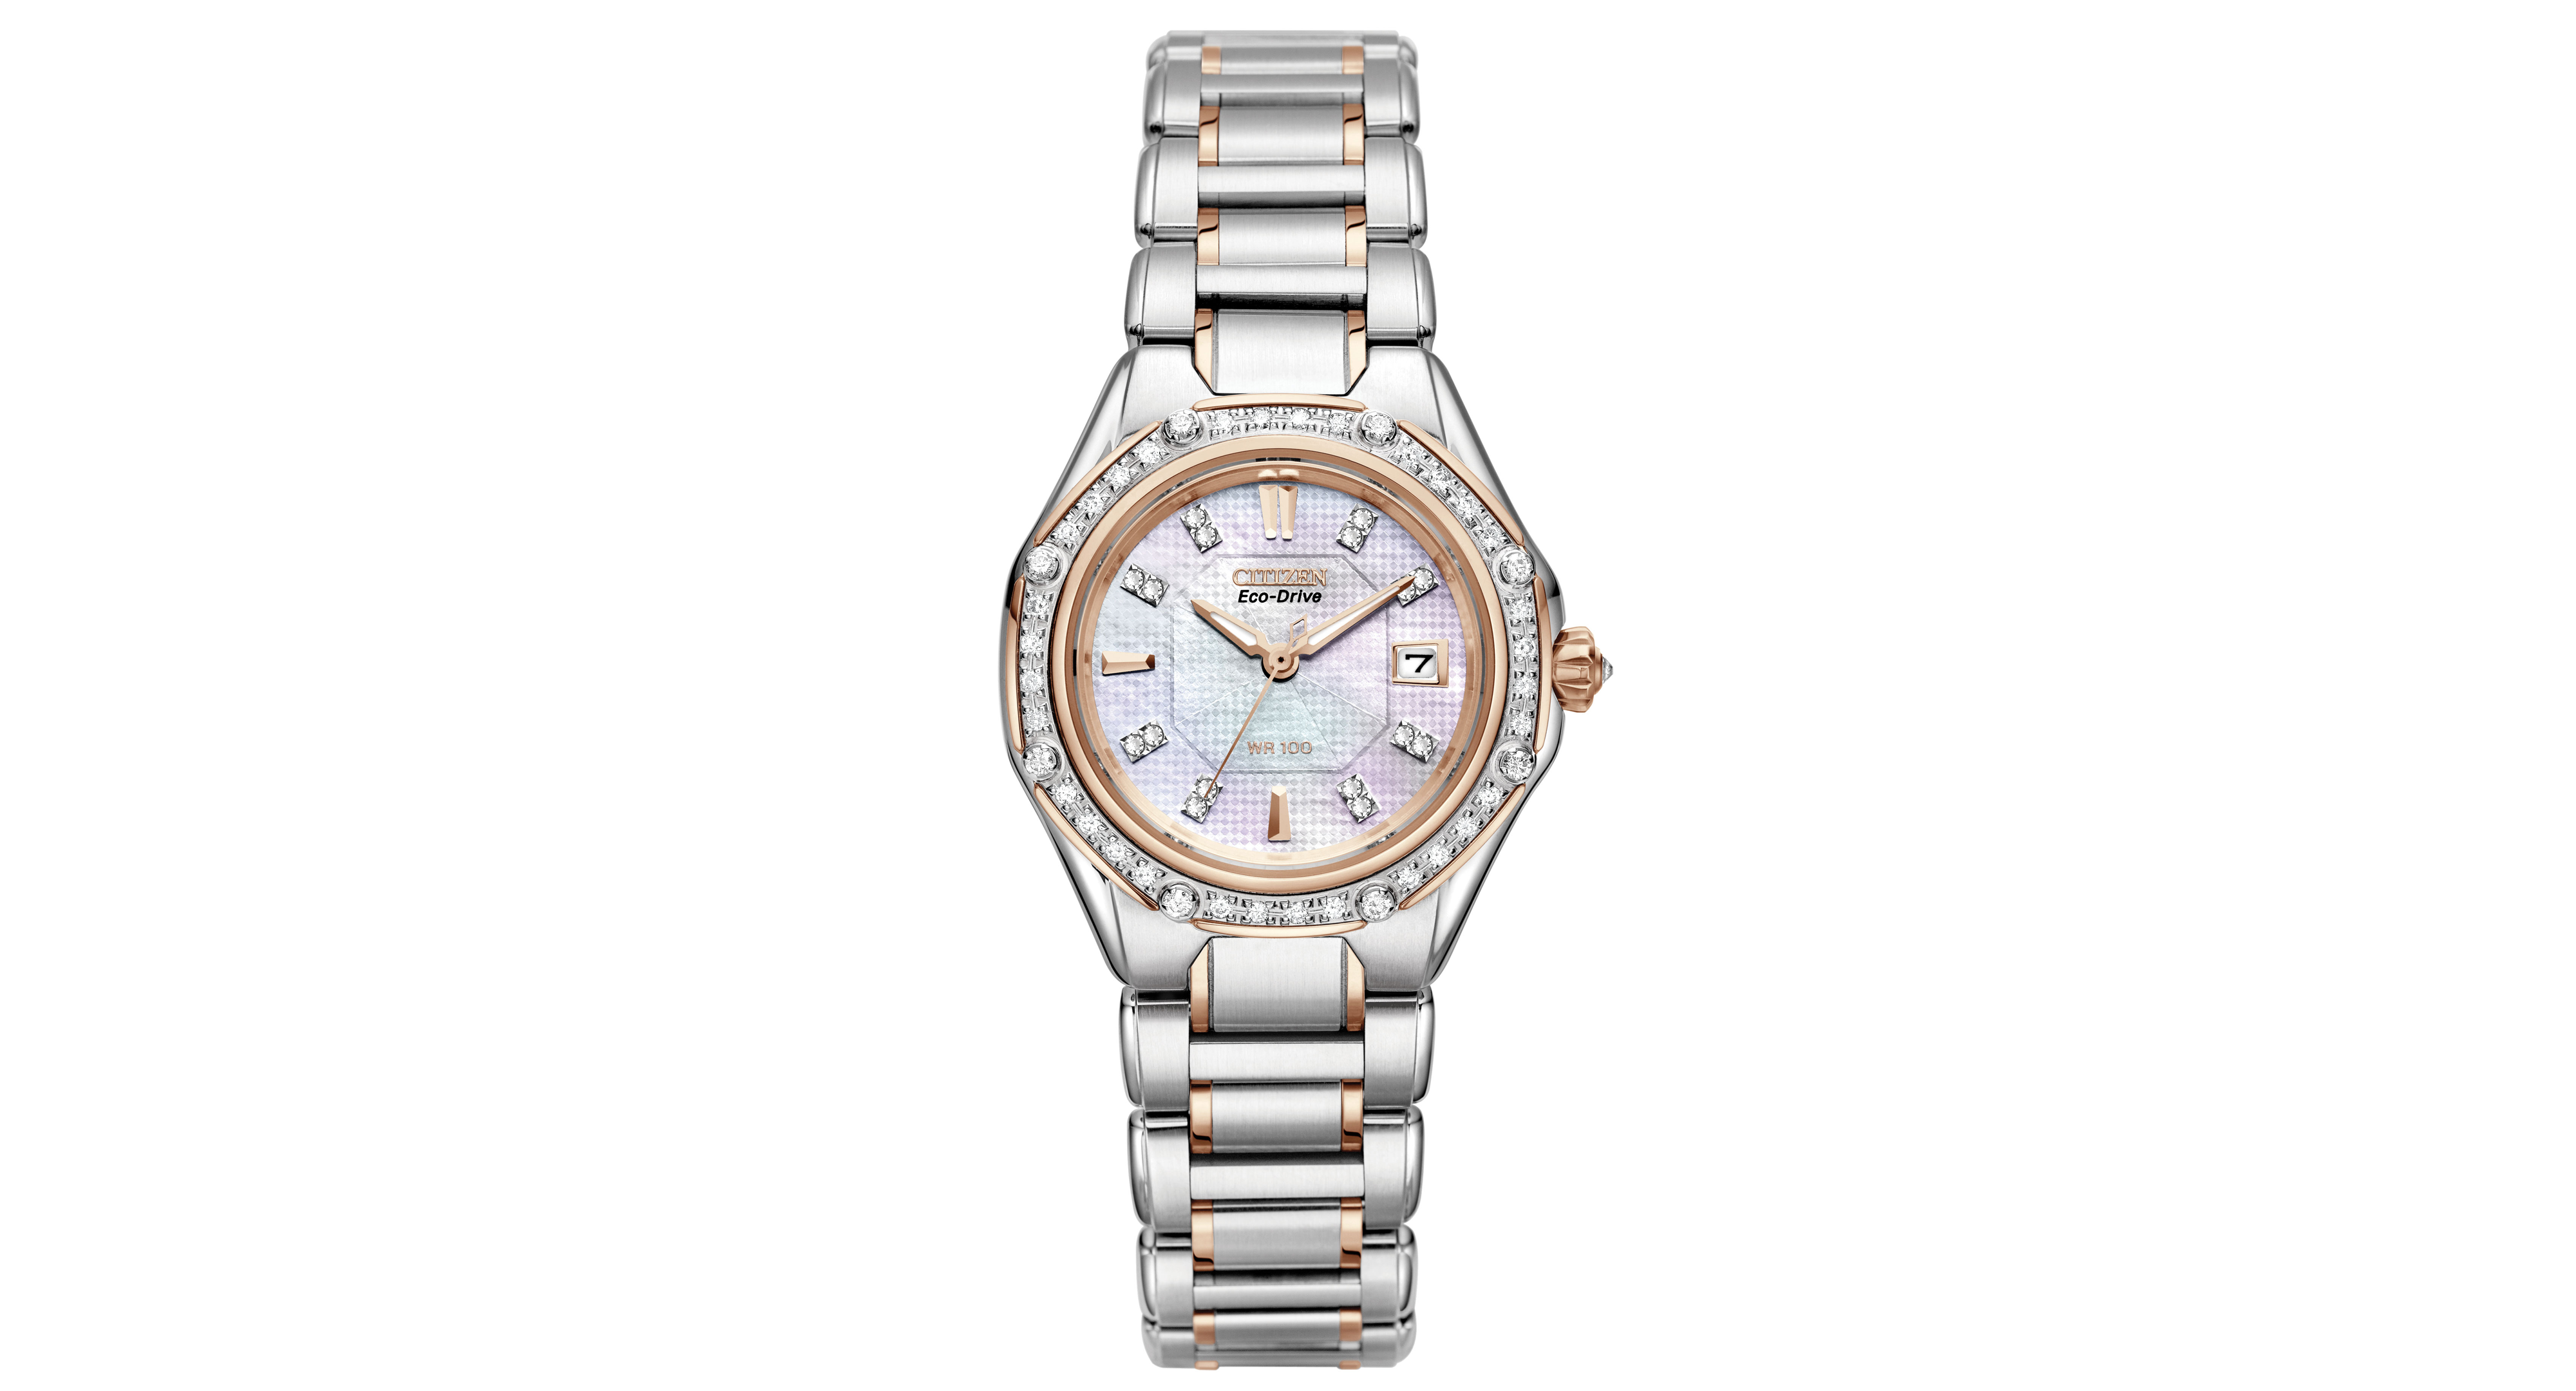 Citizen Women's Signature Octavia Eco-Drive Diamond (1/2 ct. t.w.) Two Tone Stainless Steel Bracelet Watch 29mm EW2096-57D